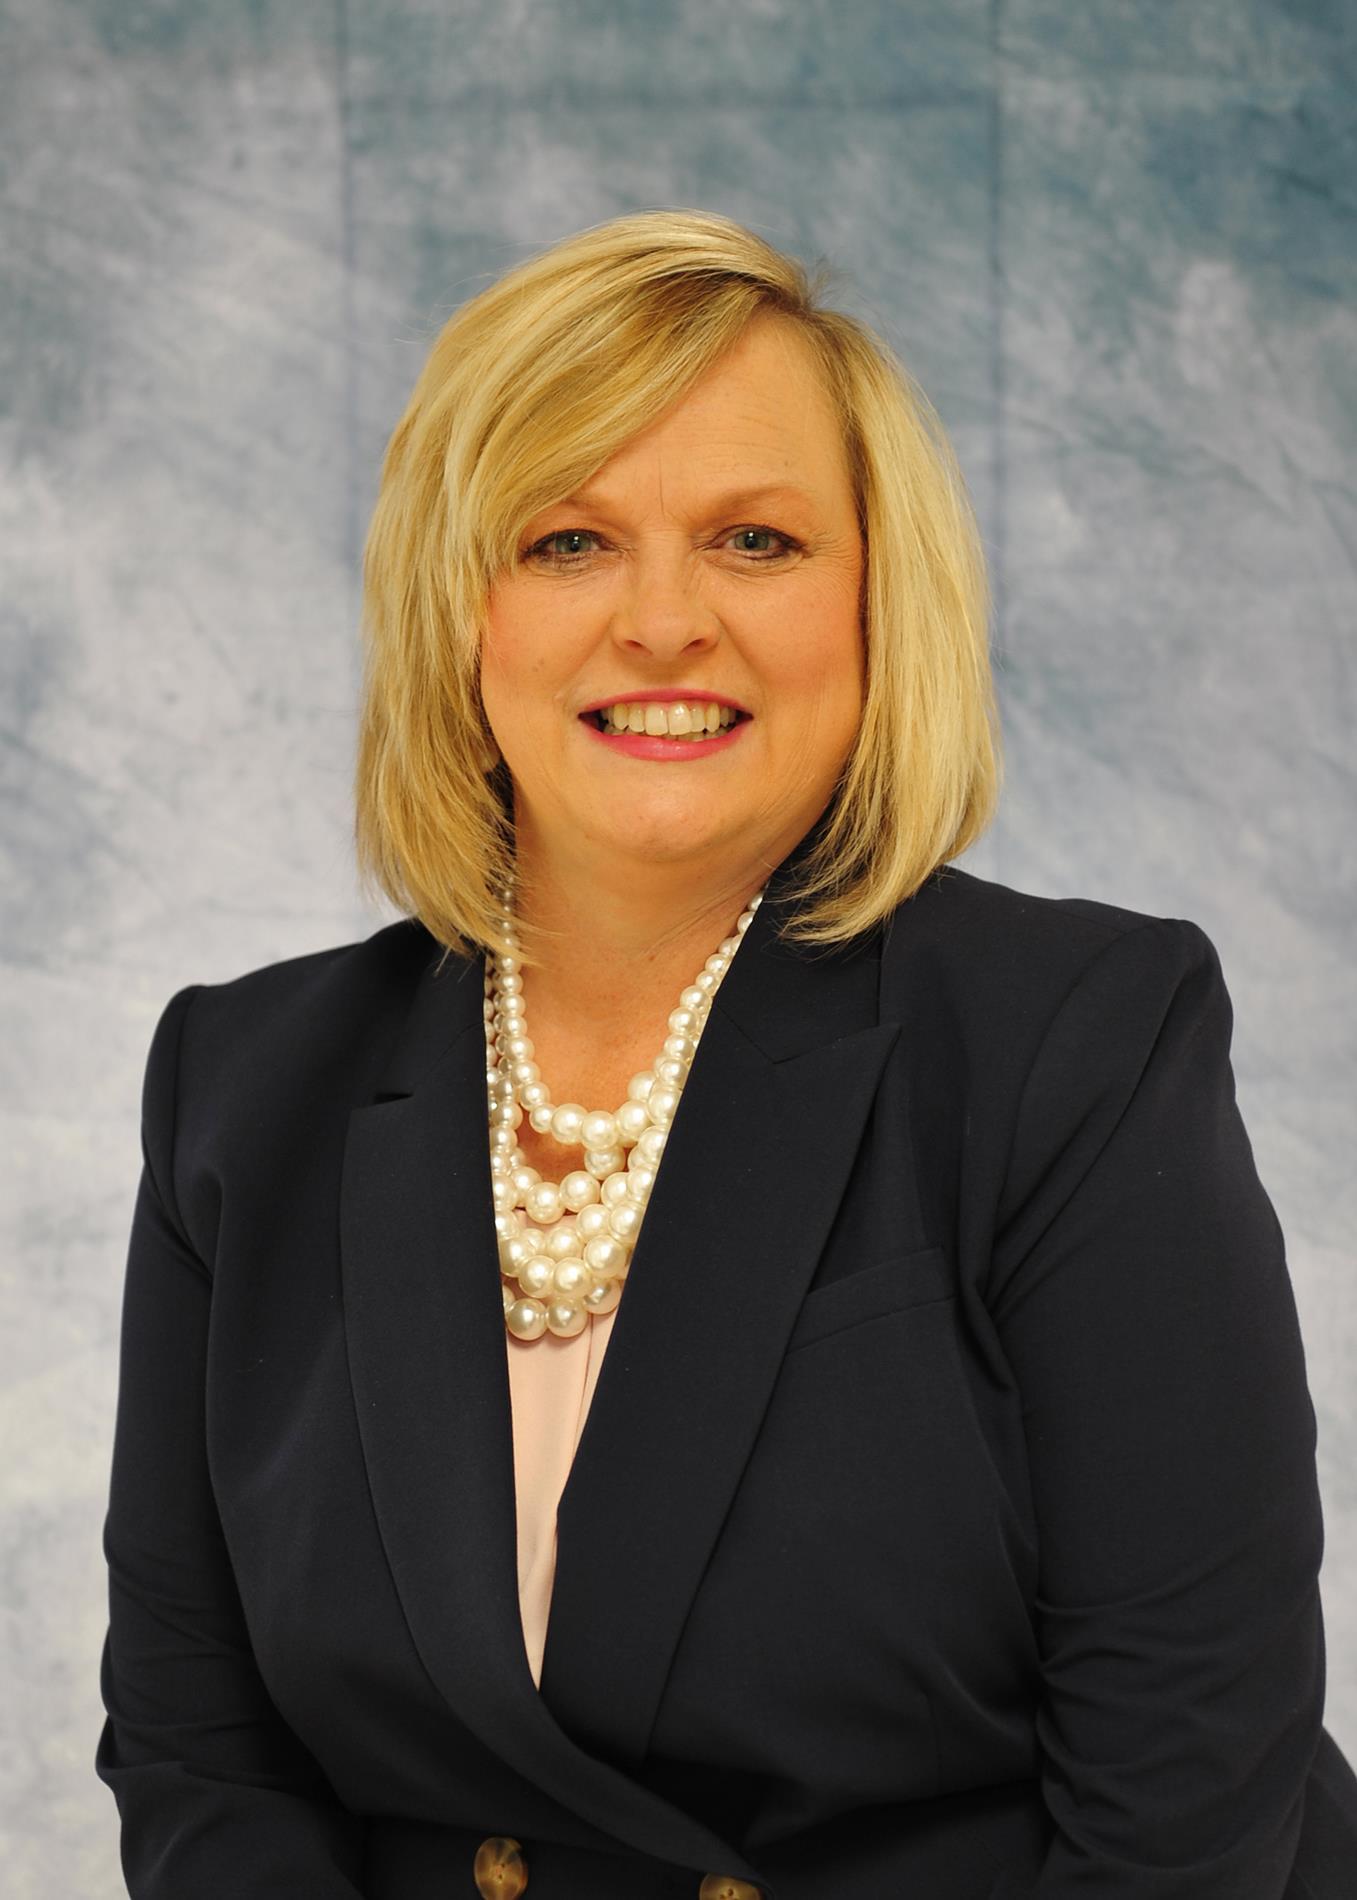 Julia Wall, Elementary Curriculum Coordinator